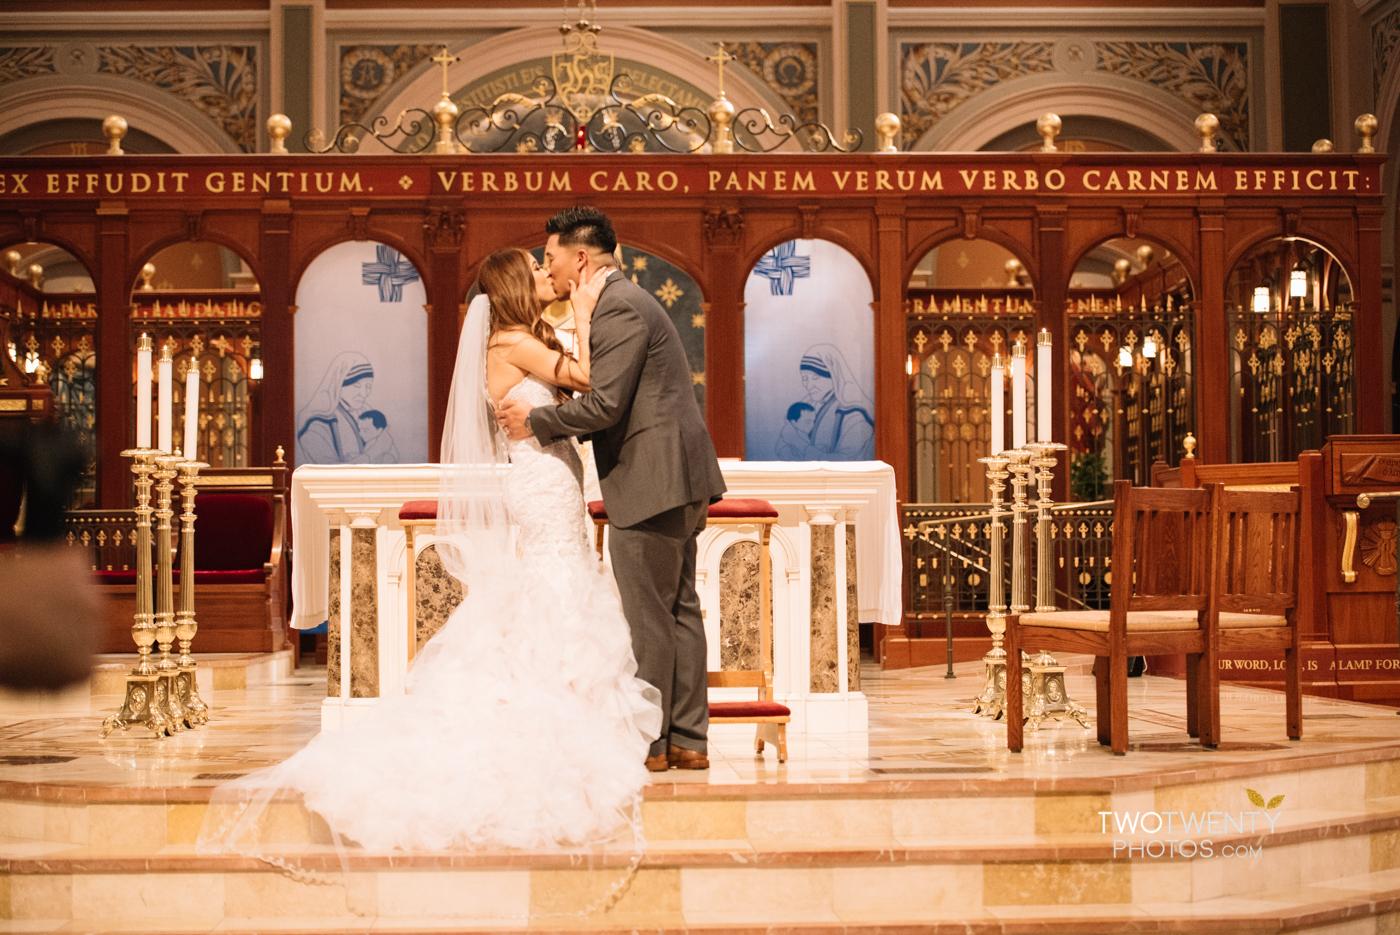 cathedral-of-the-sacred-sacrament-downtown-sacramento-wedding-photographer-29